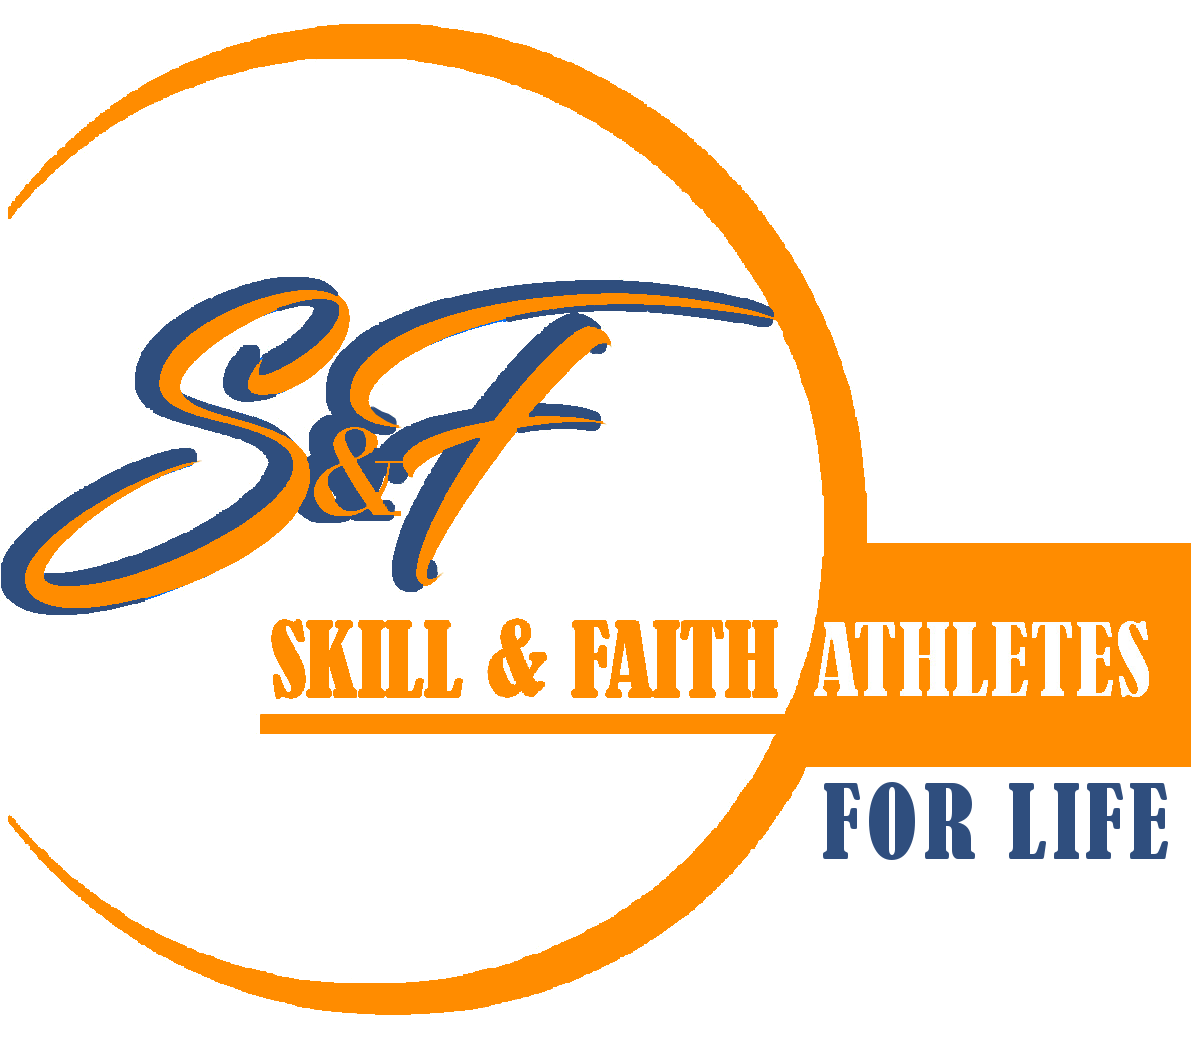 S&F Athletes